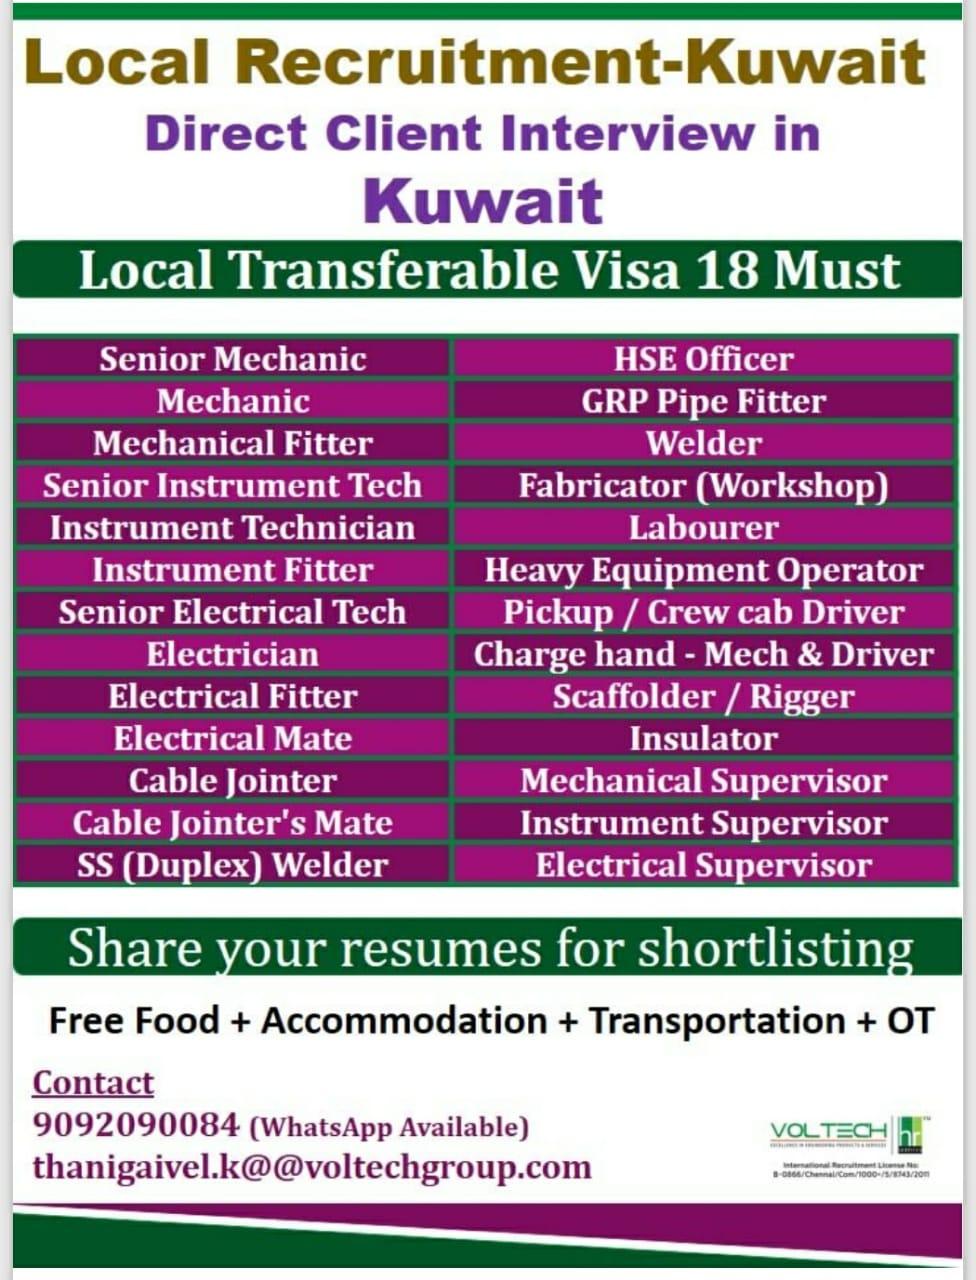 Local Recruitment-Kuwait